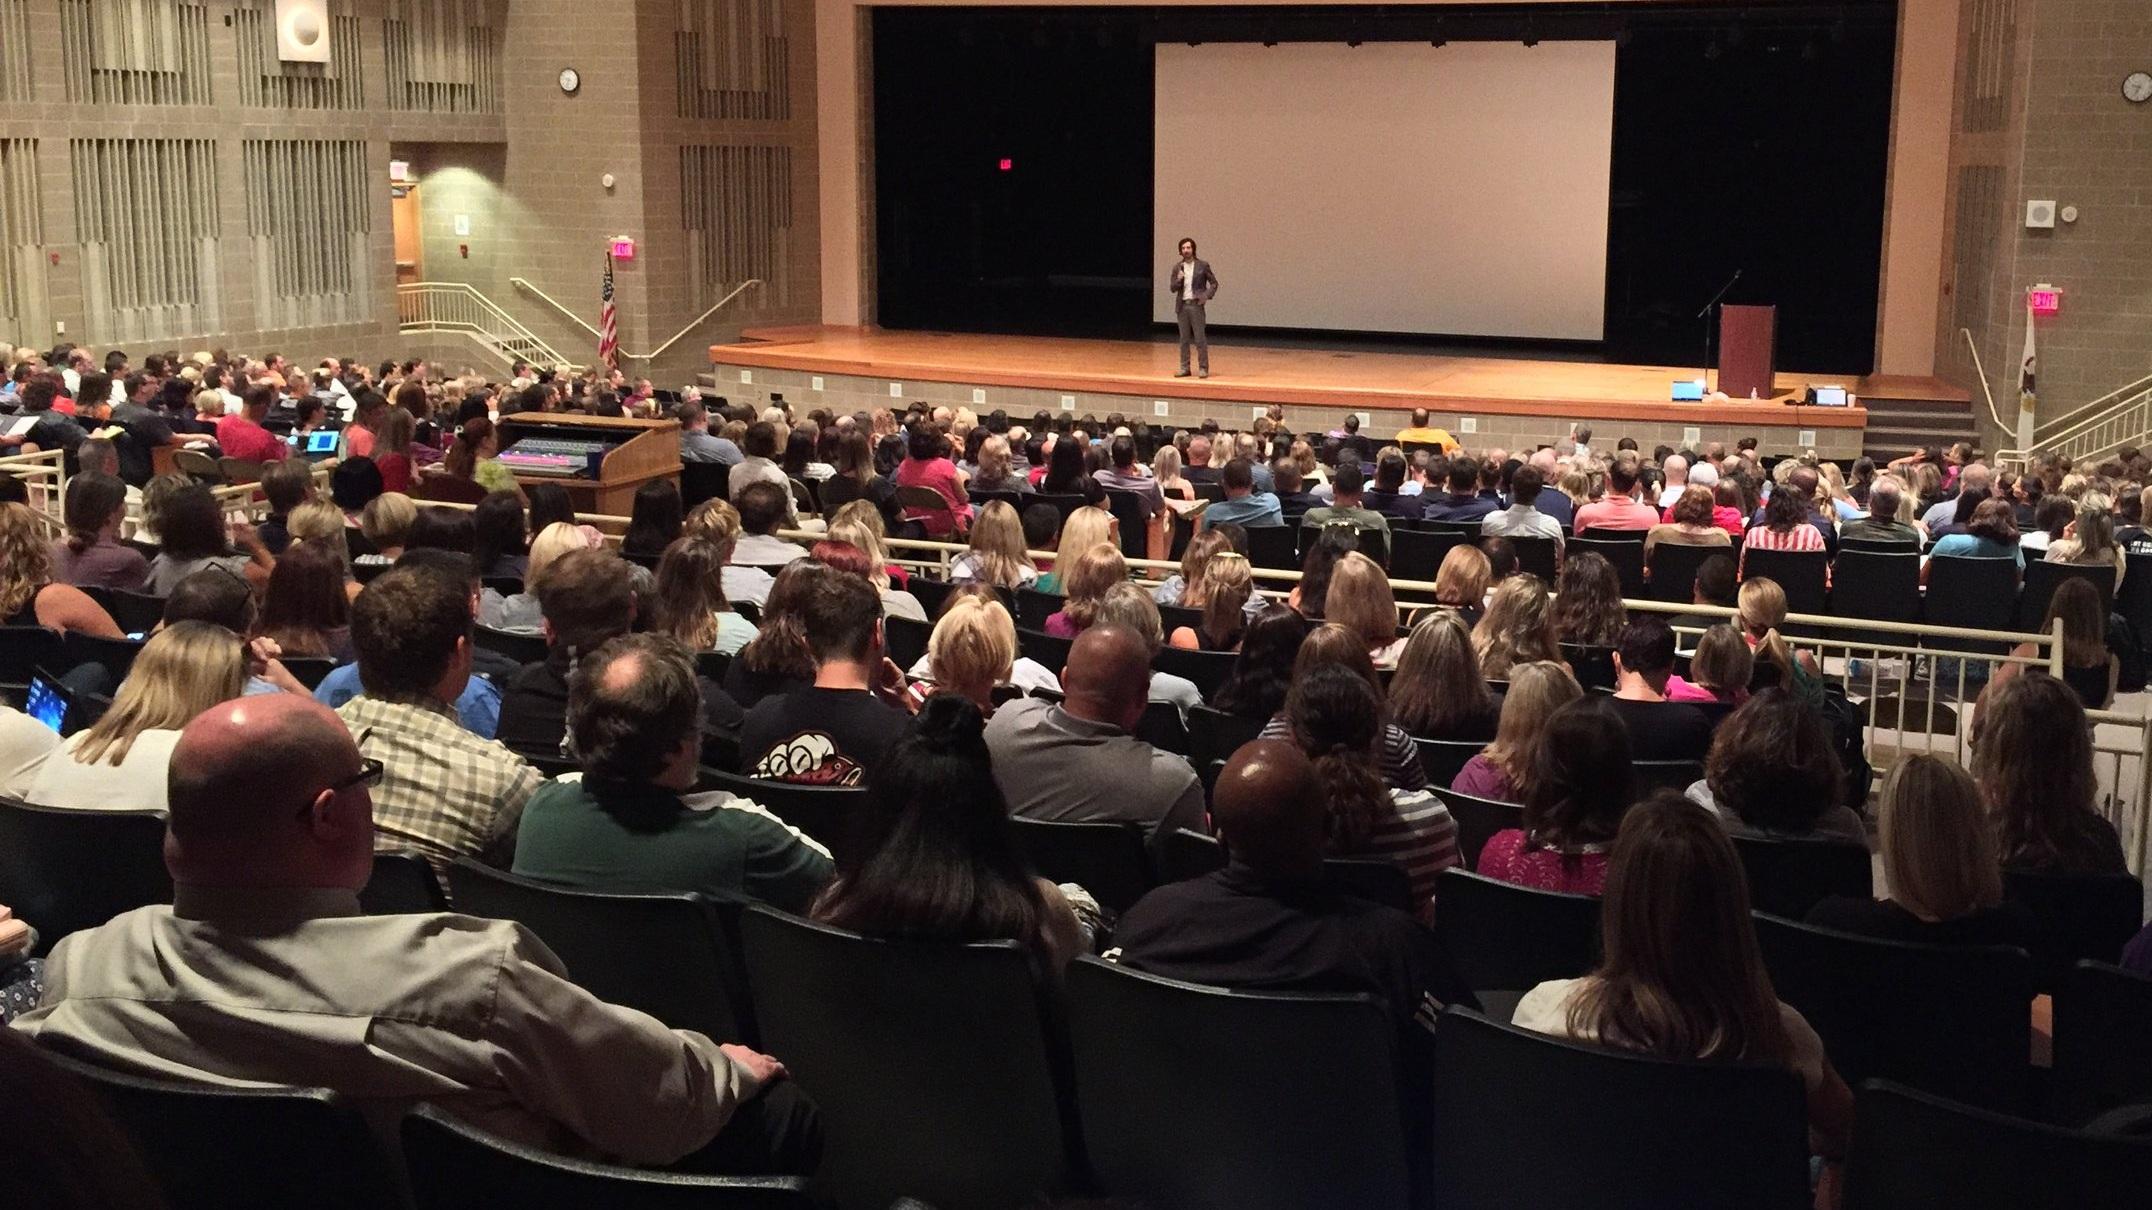 Plainfield North HS Auditorium